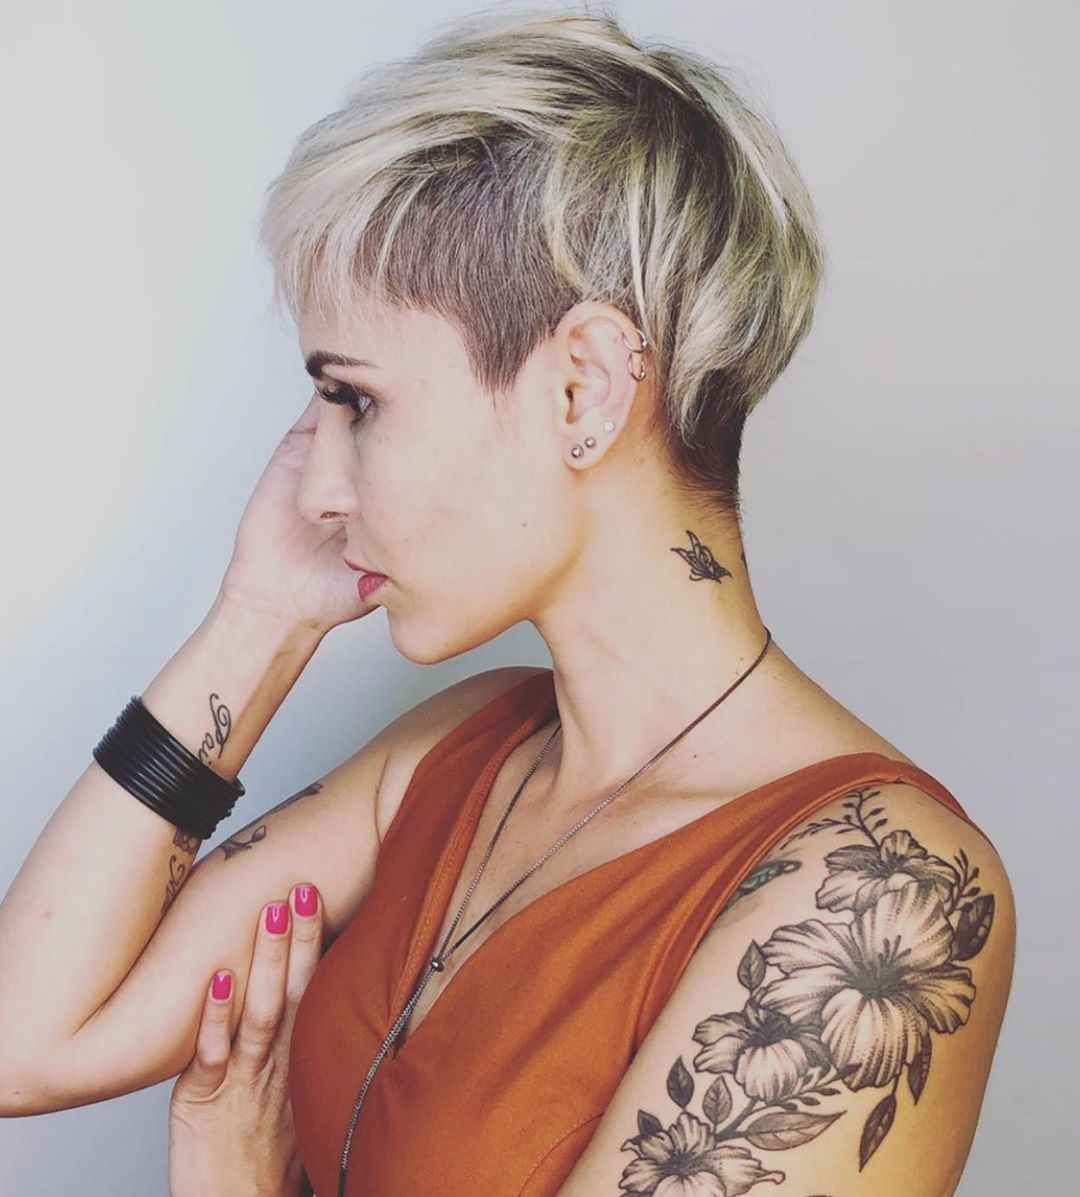 женские стрижки с выбритыми висками 2020 фото_5